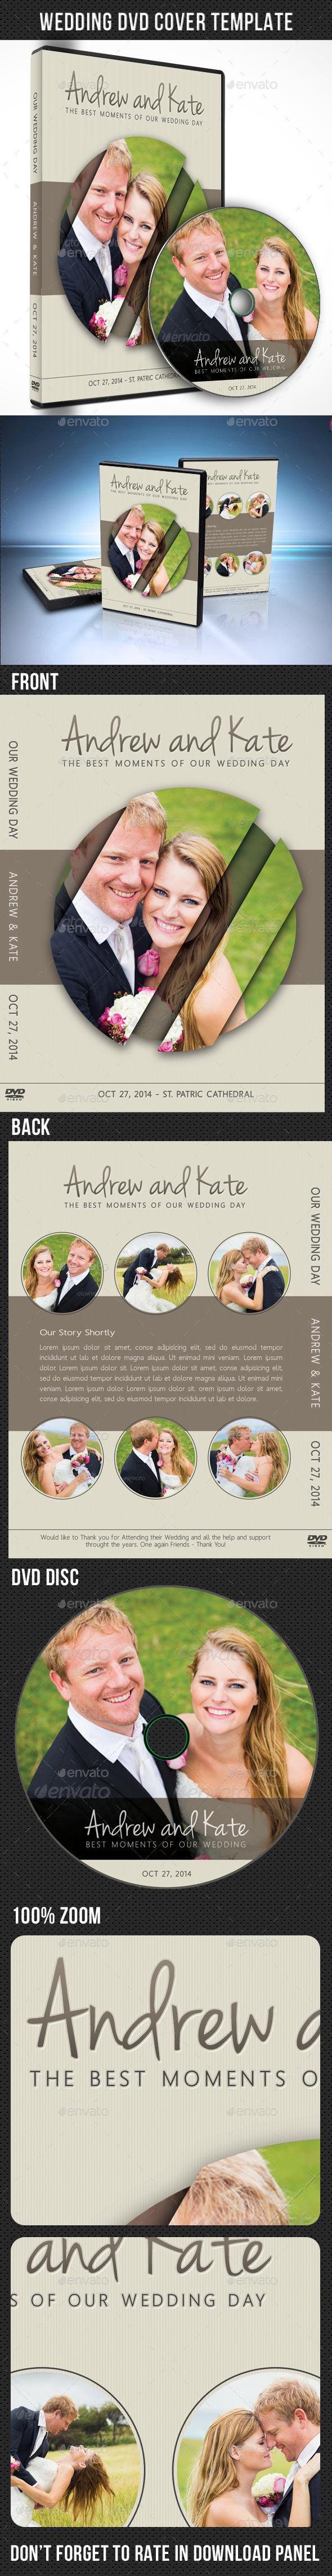 Wedding DVD Cover Template 07 - CD & DVD Artwork Print Templates